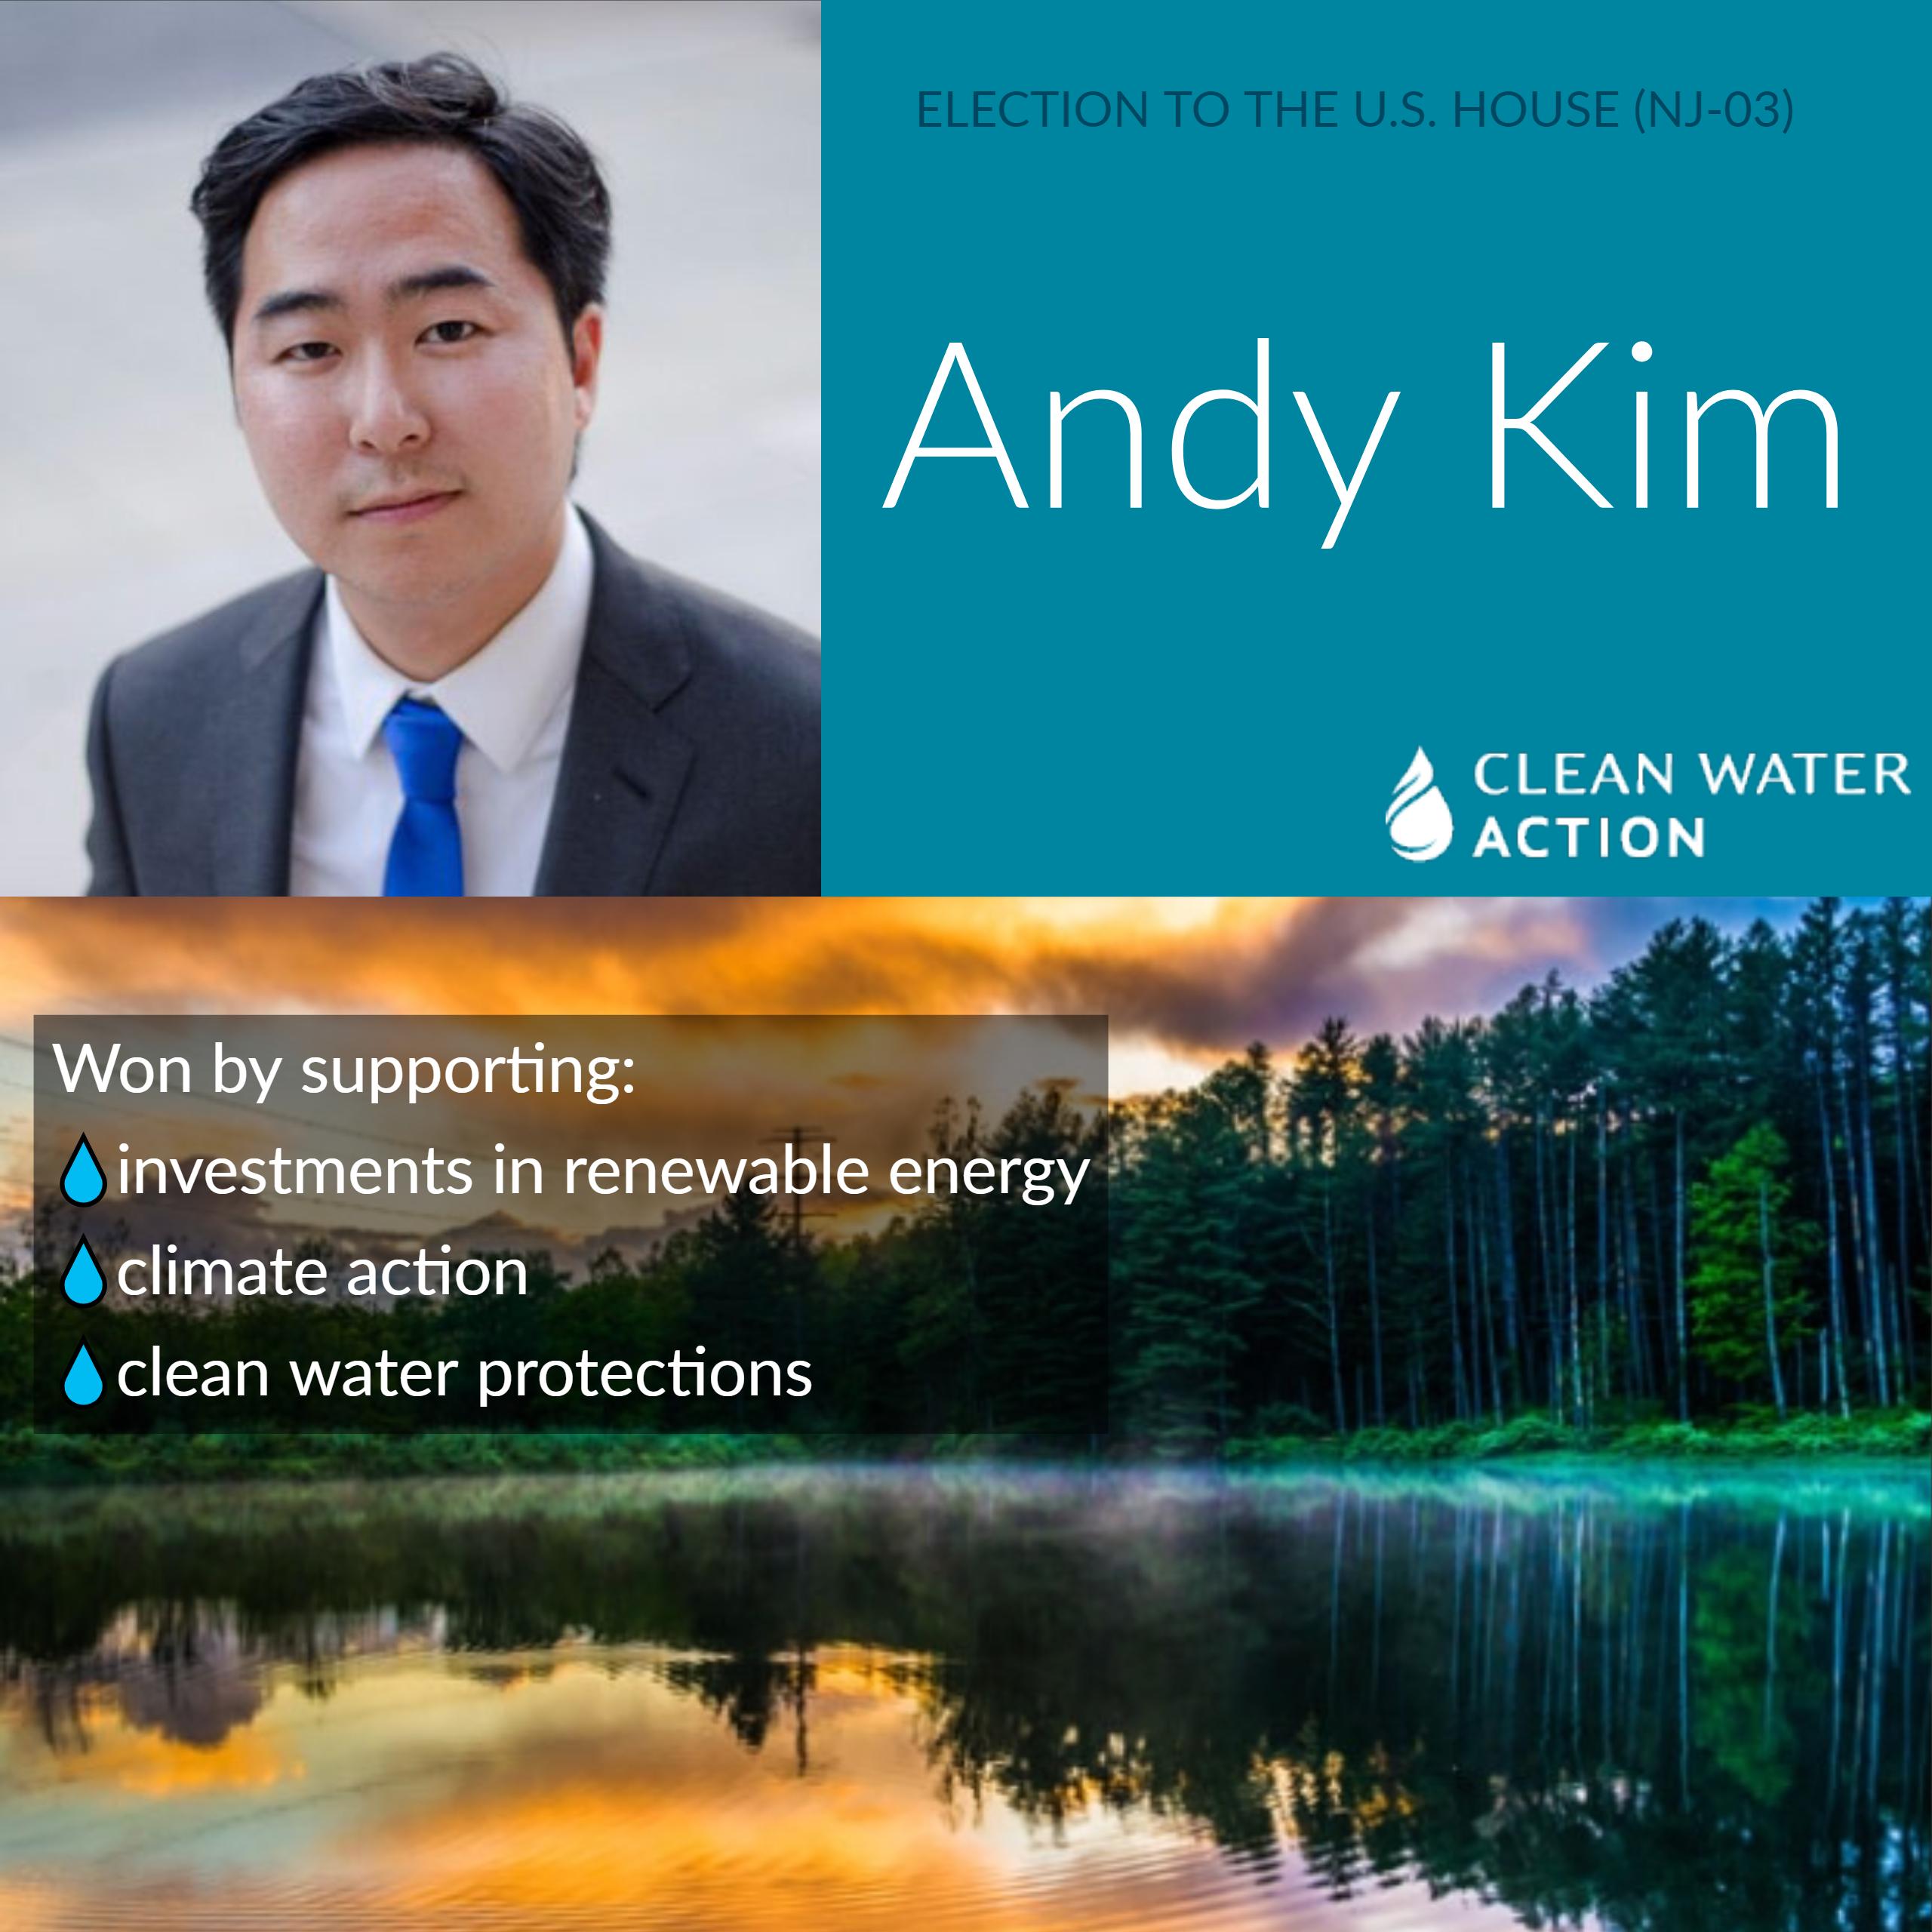 Andy Kim